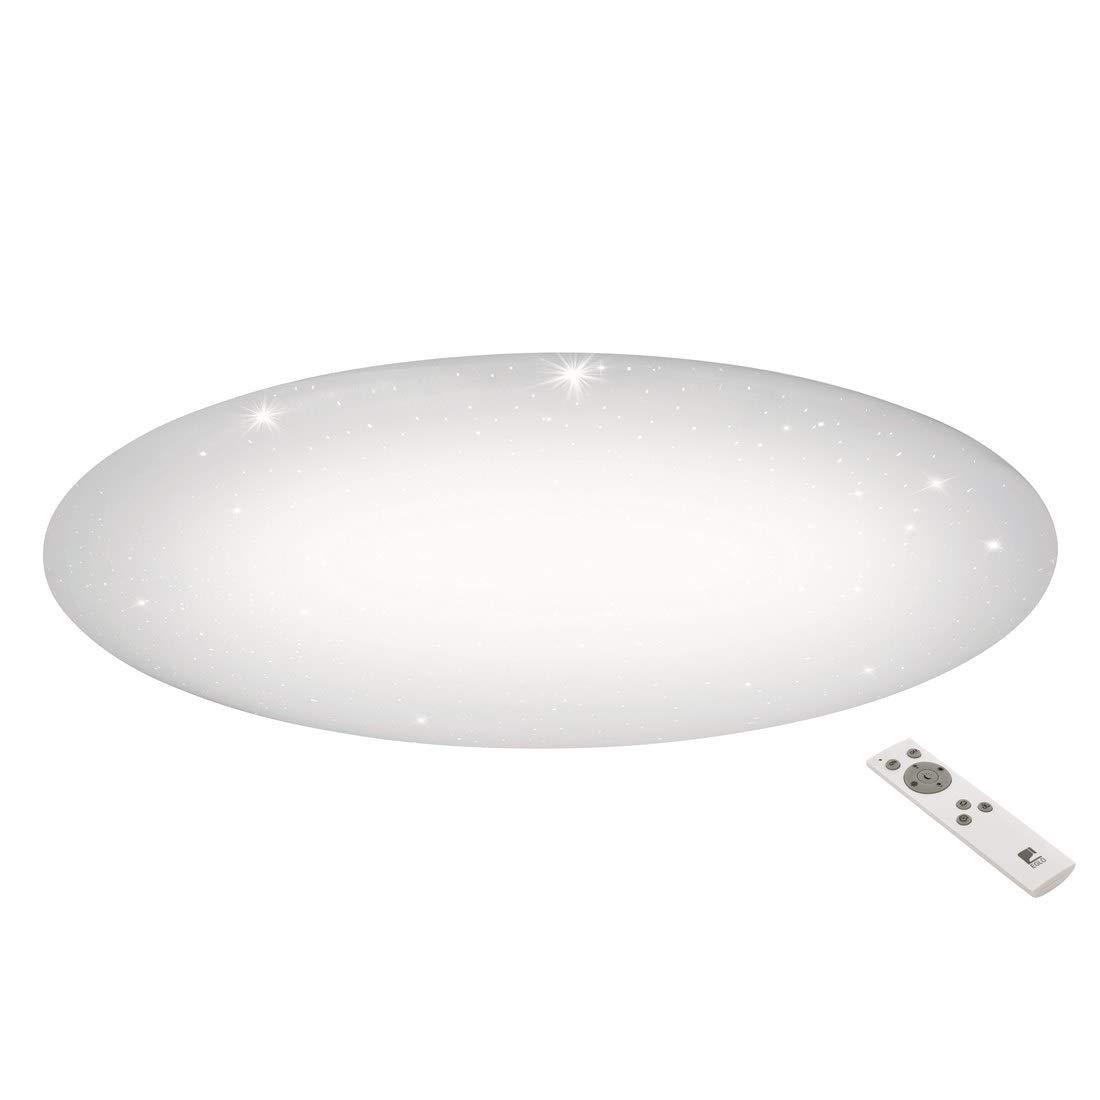 LED Deckenleuchte GIRON-S weiss weiss Ø100cm H 12cm